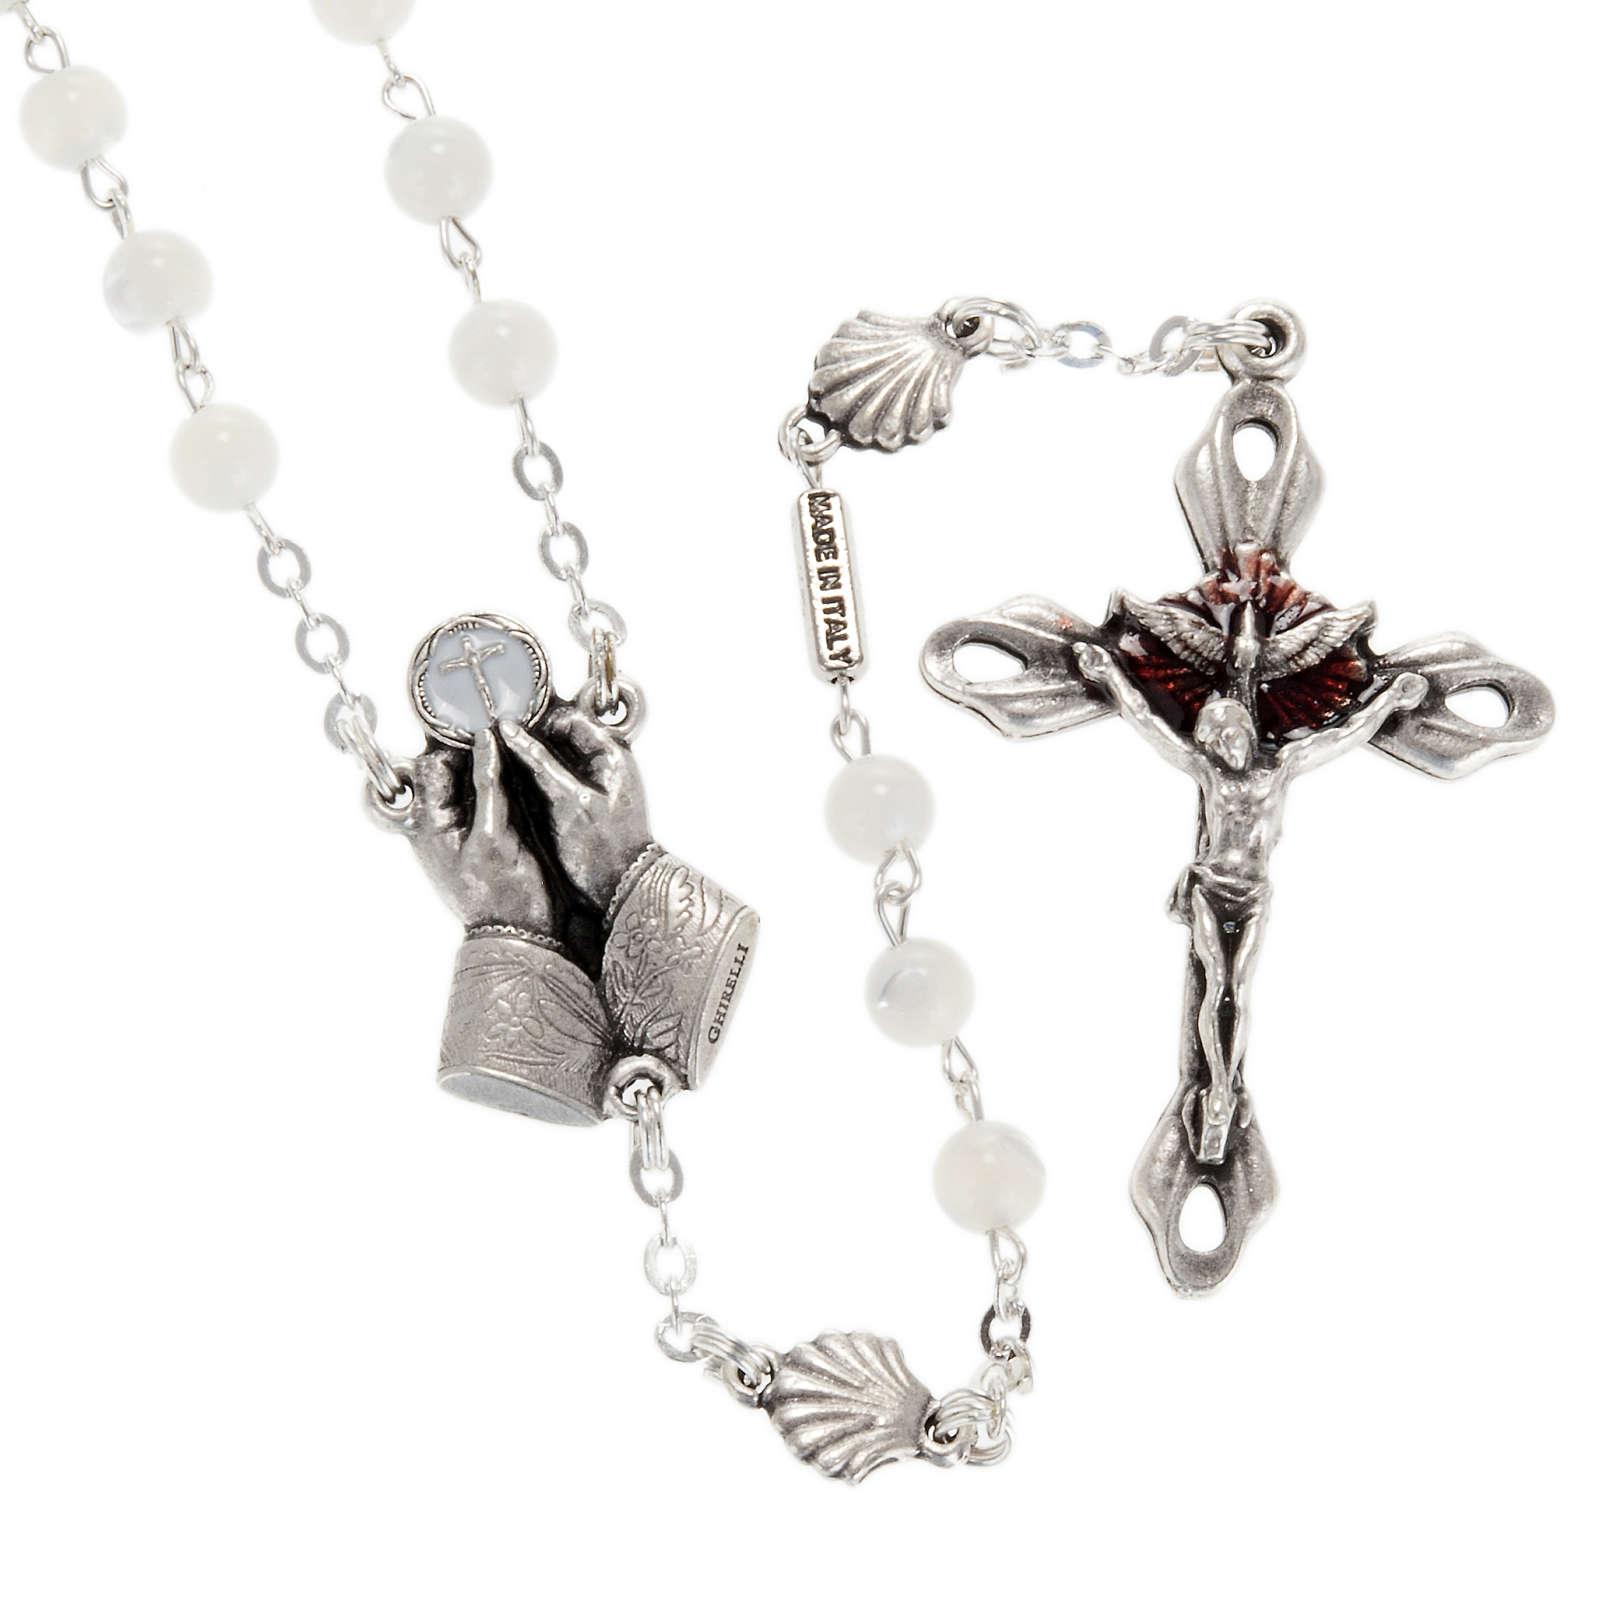 Chapelet Ghirelli nacre Divine Miséricorde 4